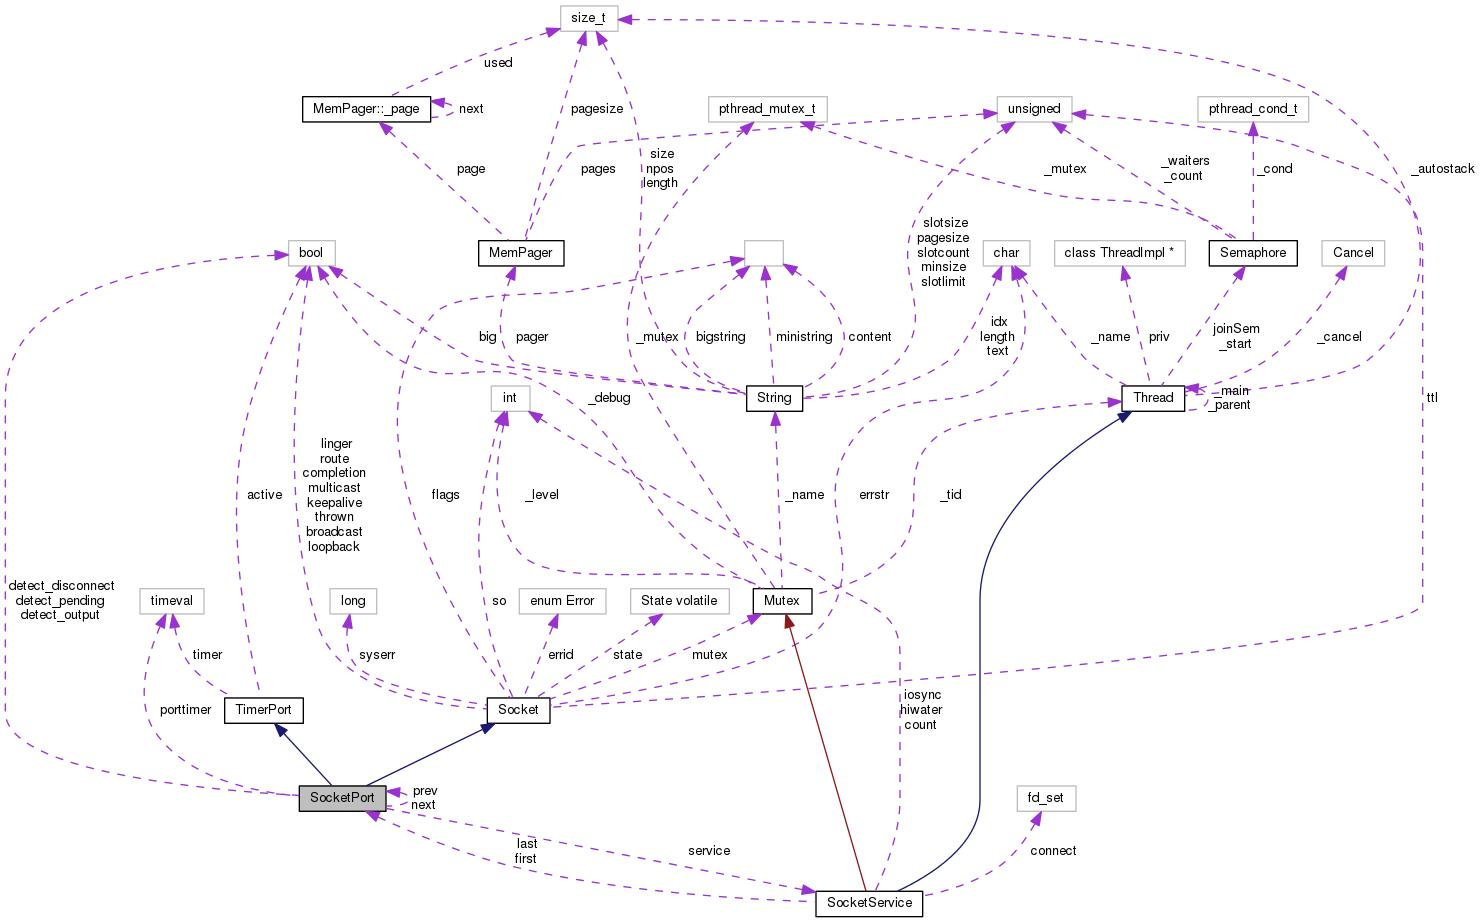 Bayonne2 / Common C++ 2 Framework: SocketPort Class Reference